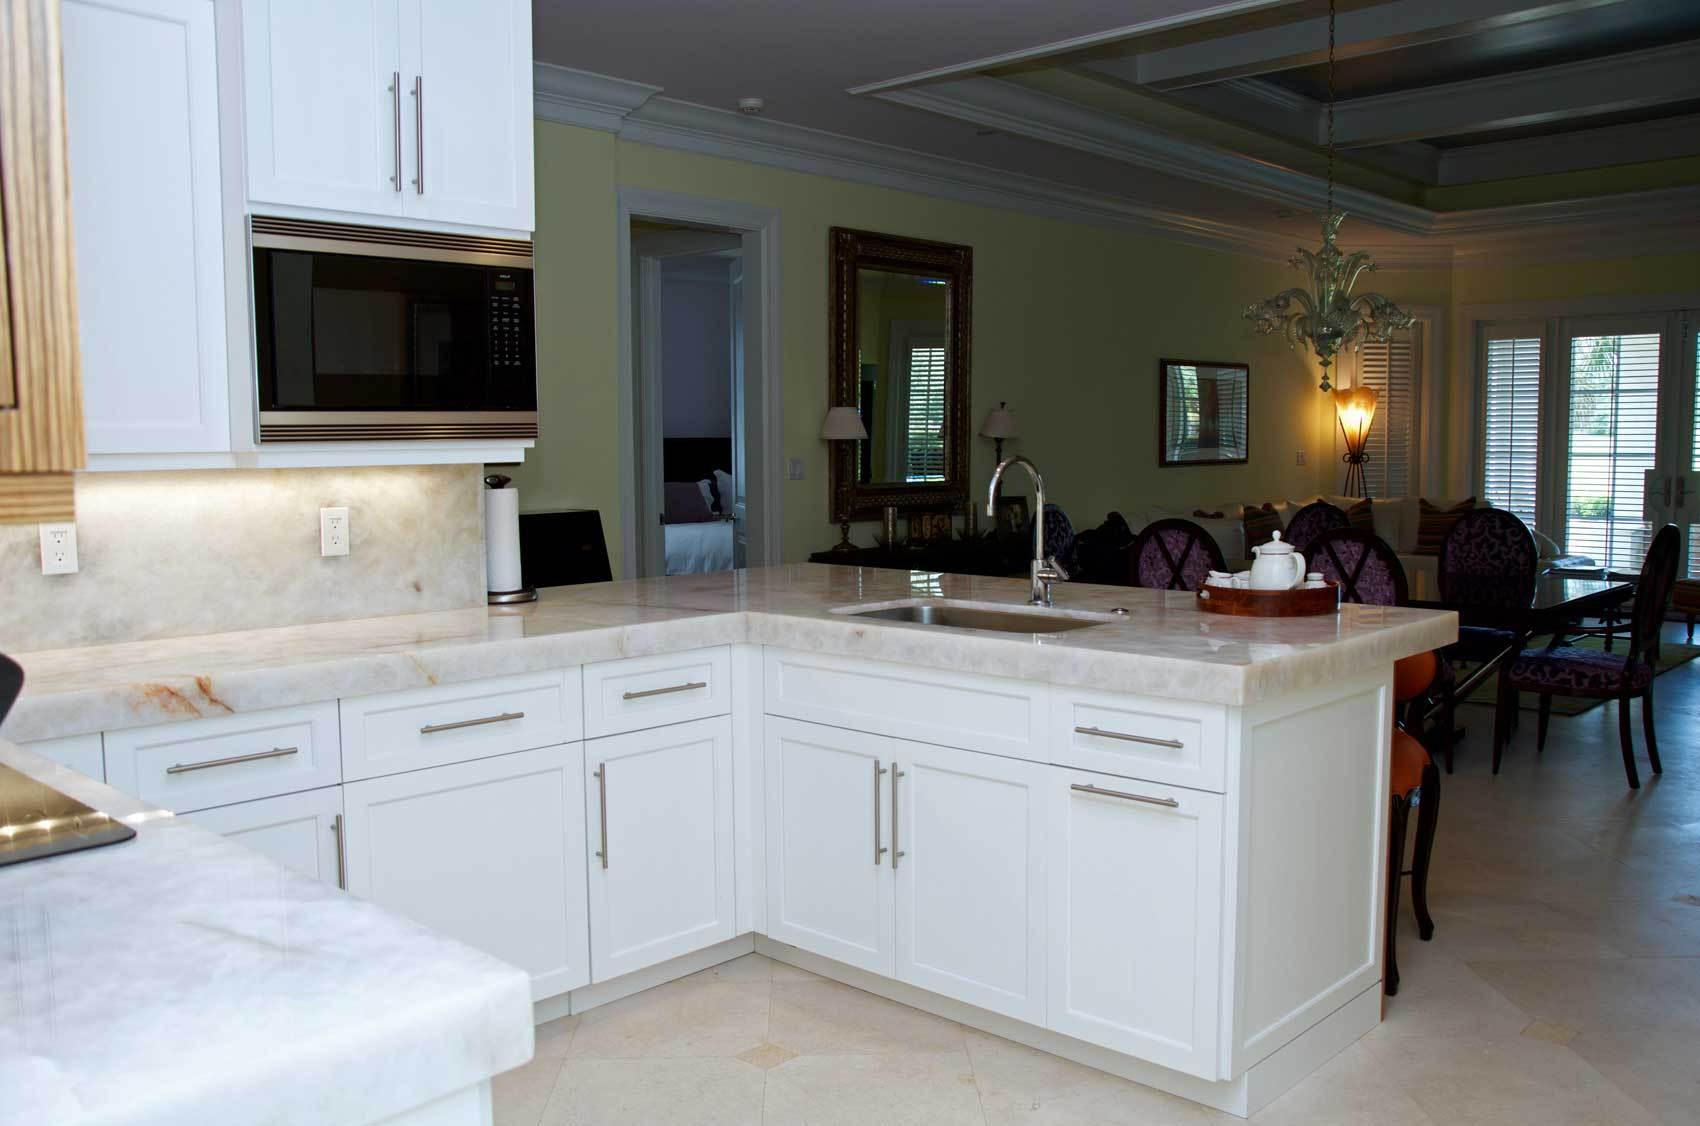 DSC_9806-transitional-kitchen-cabinetry